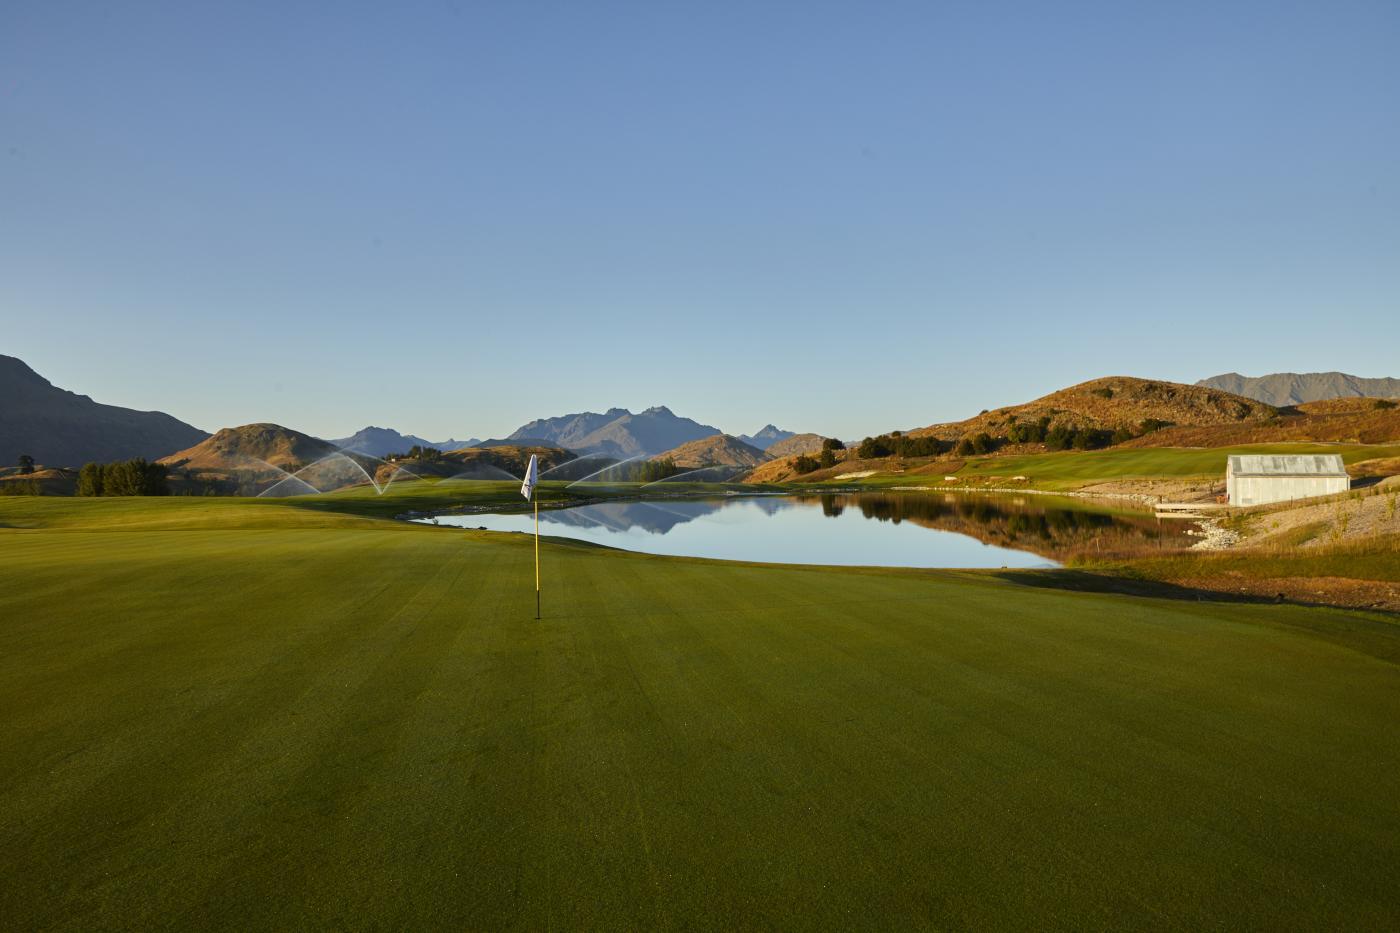 New Coronet 9 Golf Course Millbrook